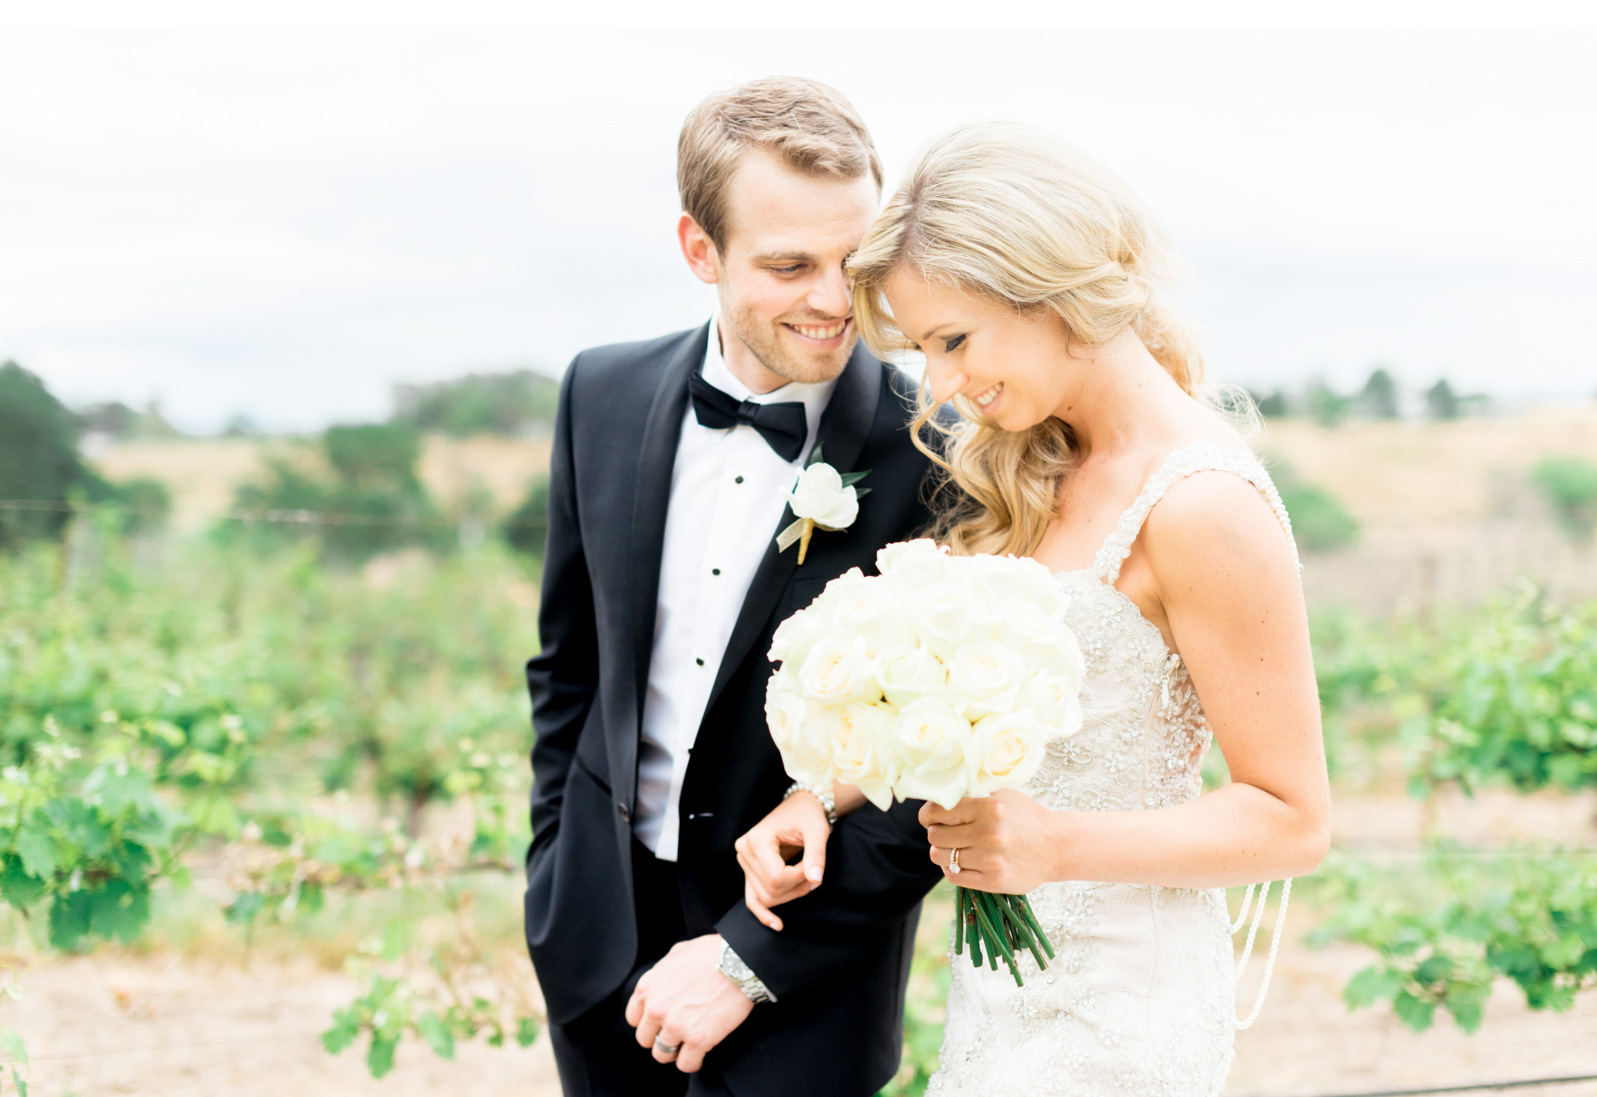 Southern-California-Wedding-Photographer-Natalie-Schutt-Photography_29.jpg